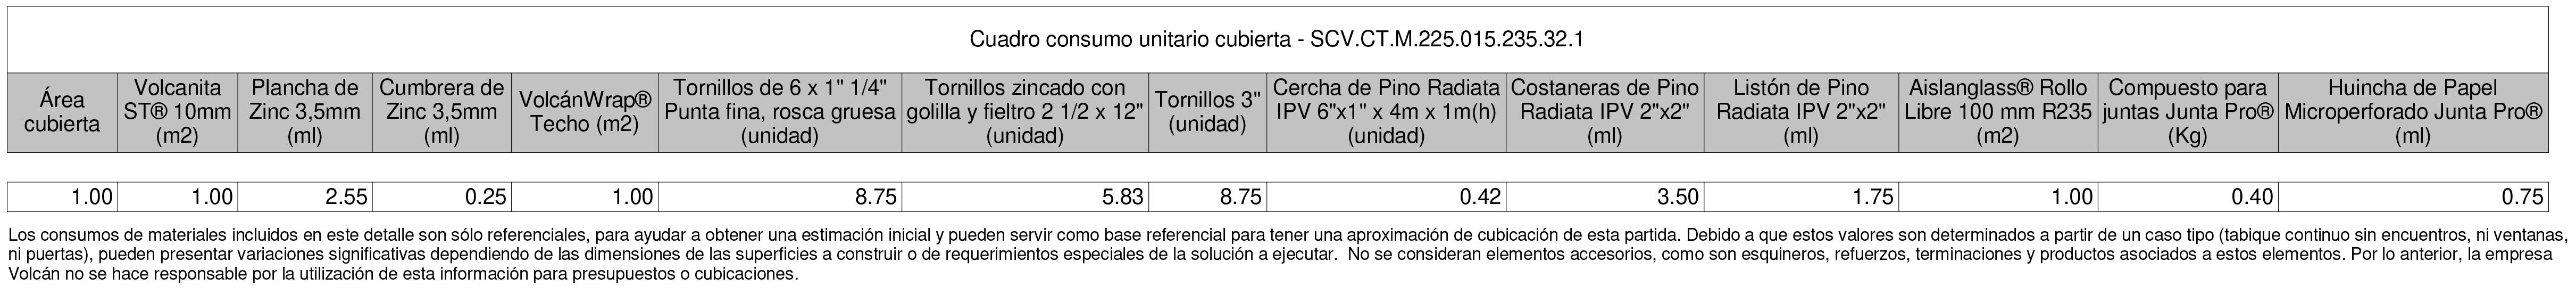 Solución Cielo Techumbre de Volcan en BIM. Solución en rvt, ifc, dwg, para revit, BIM, de Volcan